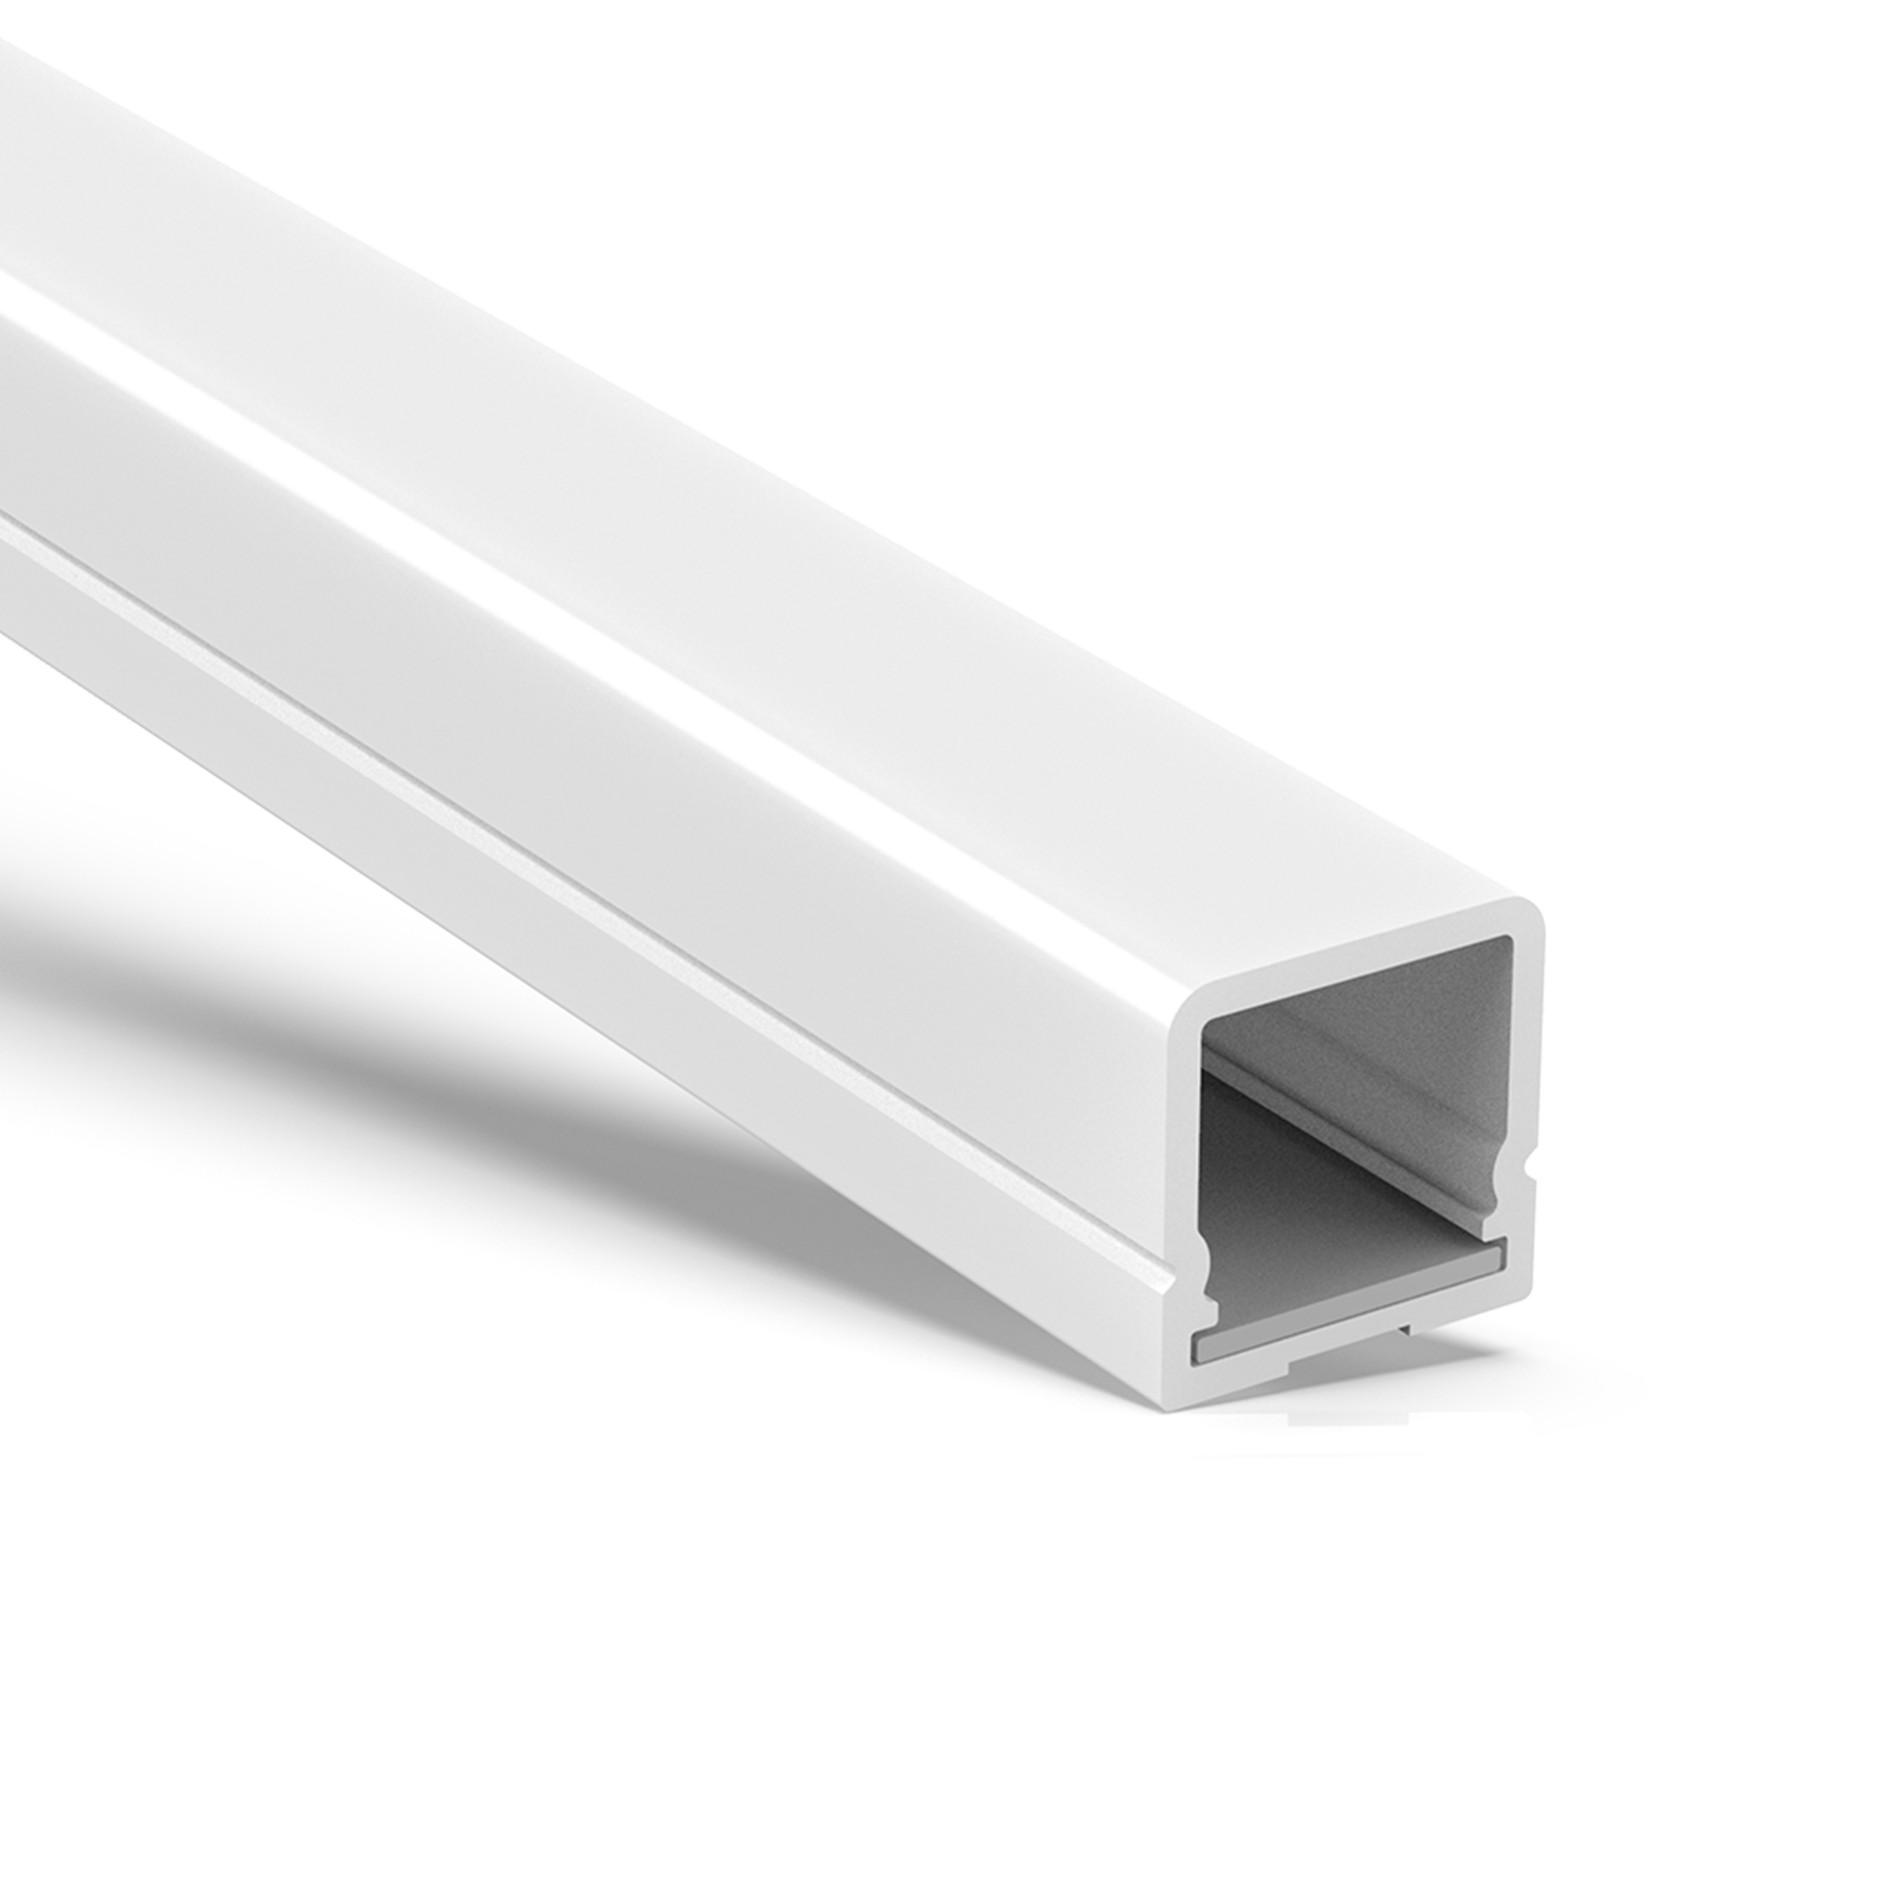 WP2 IP67 rated profile led light 17x17mm